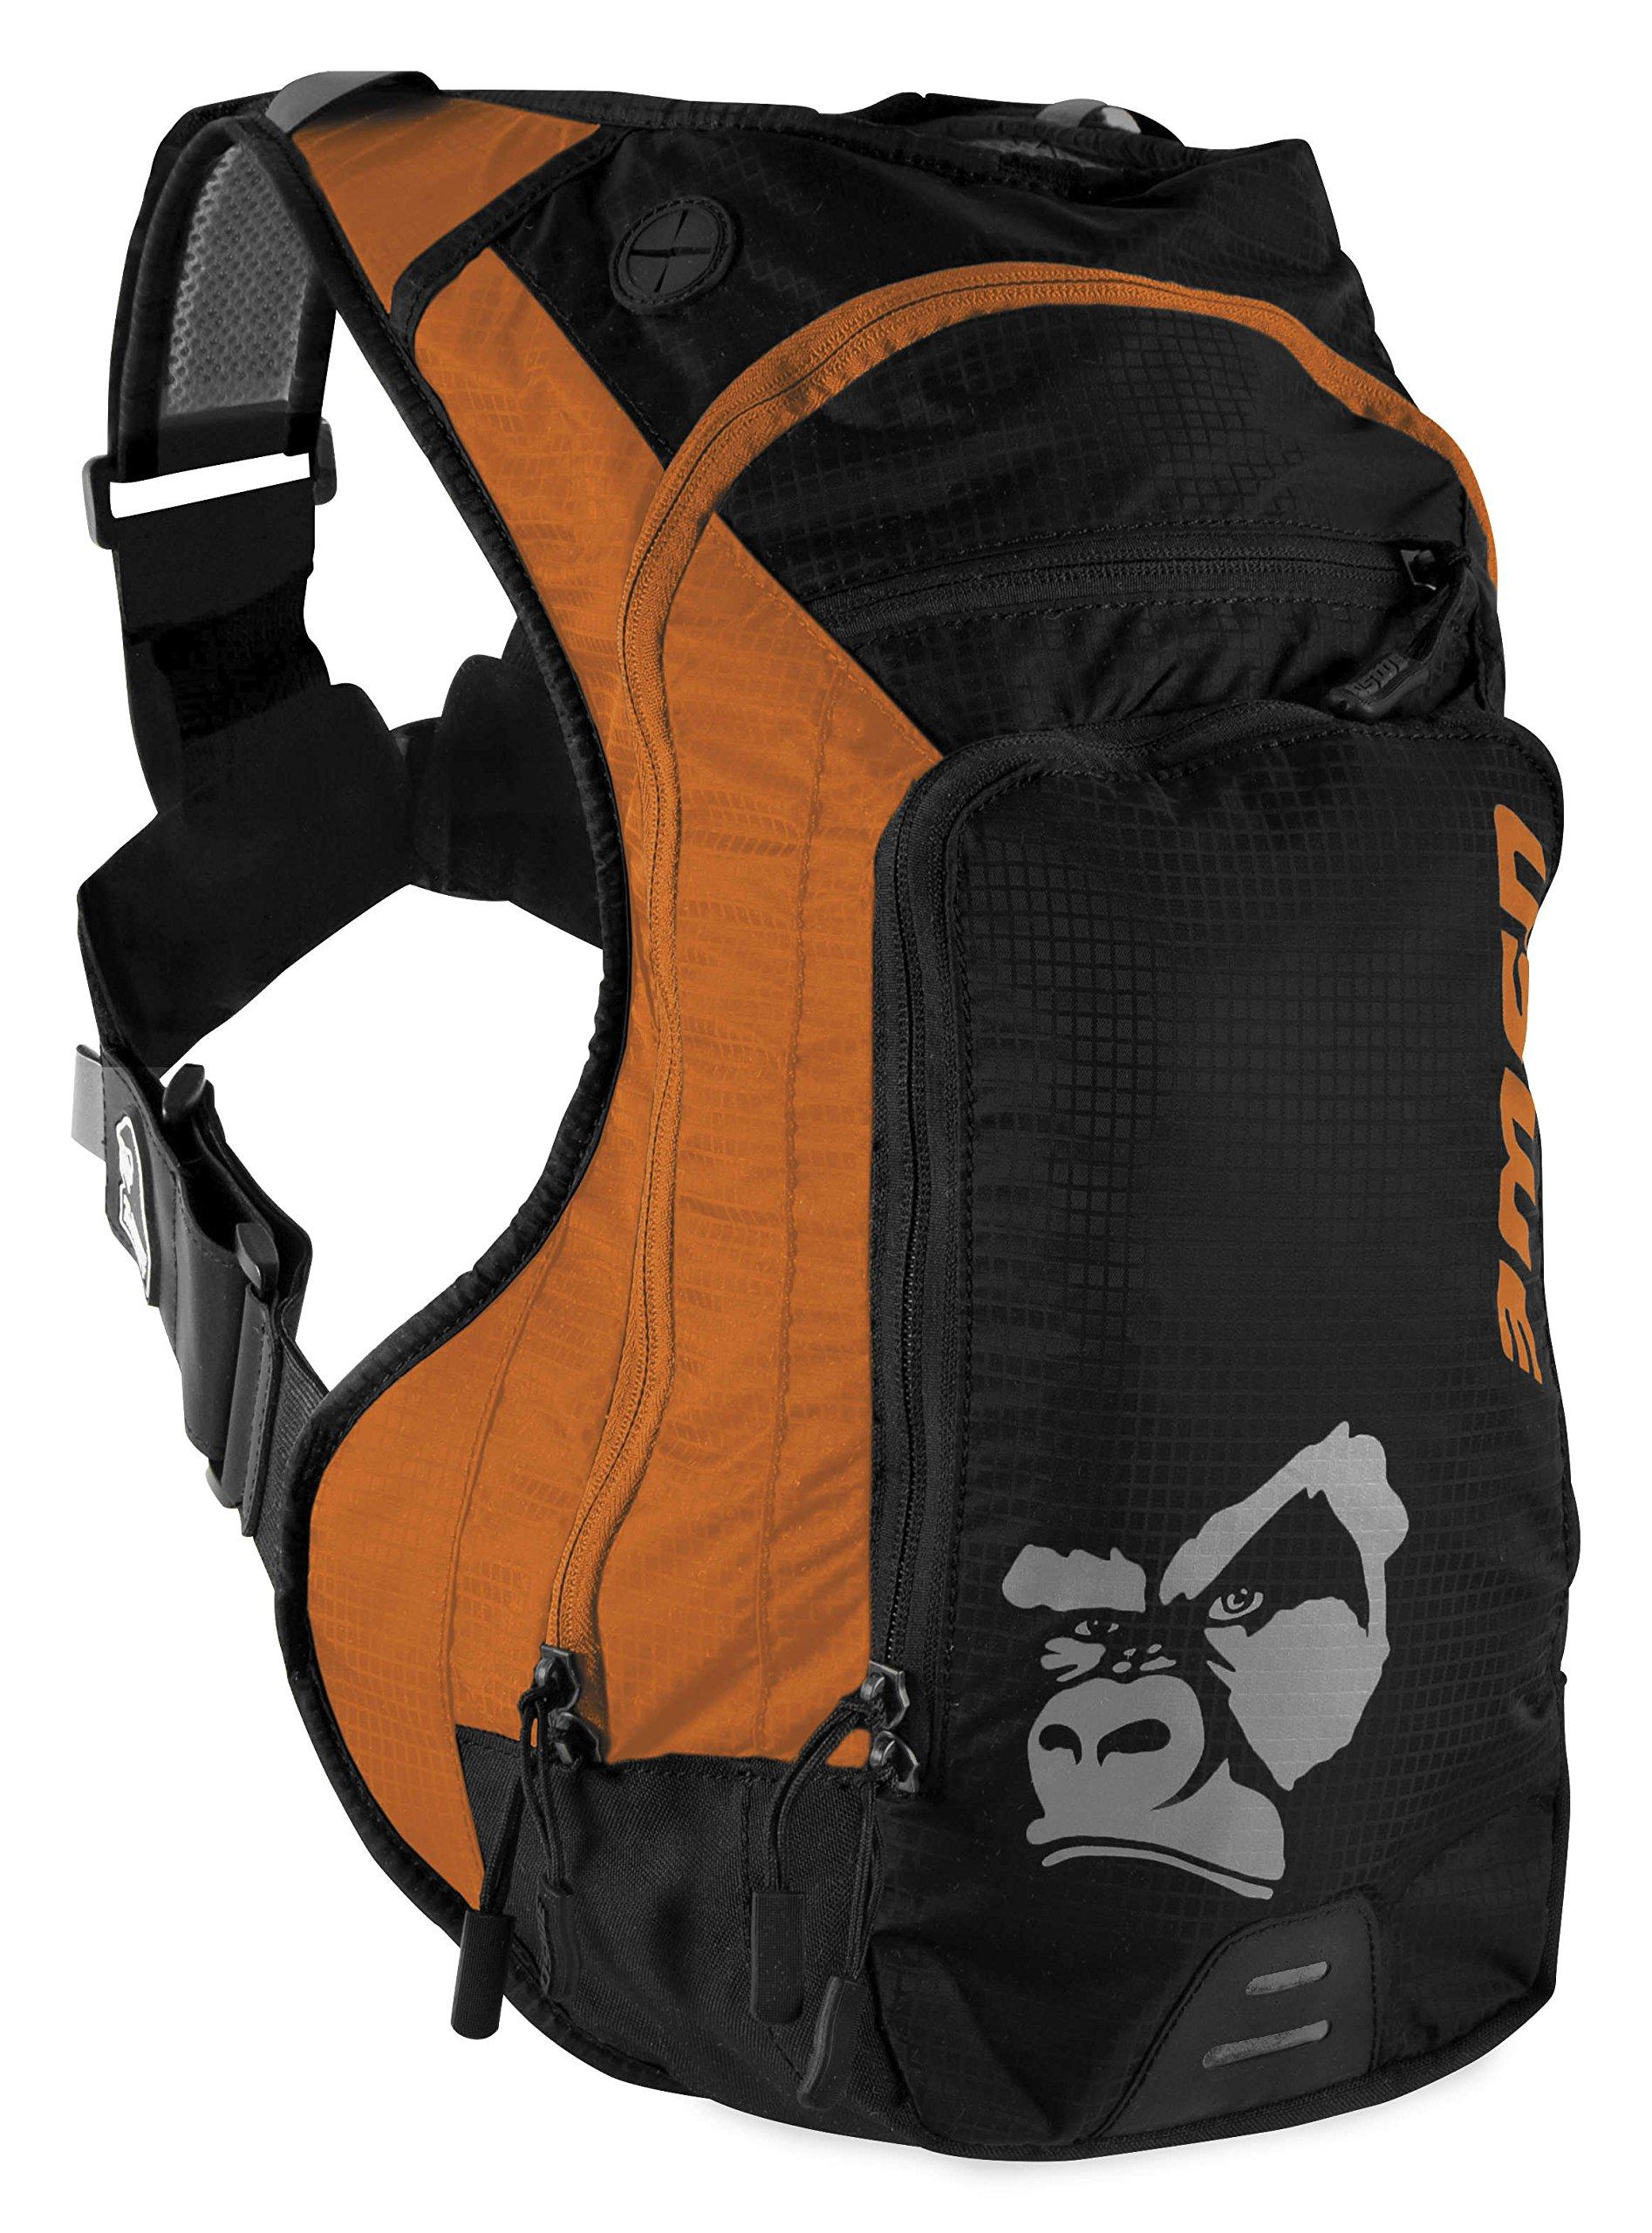 Uswe Orange-Black Ranger - 9 Litre Hydration Pack (Default , Orange) by USWE